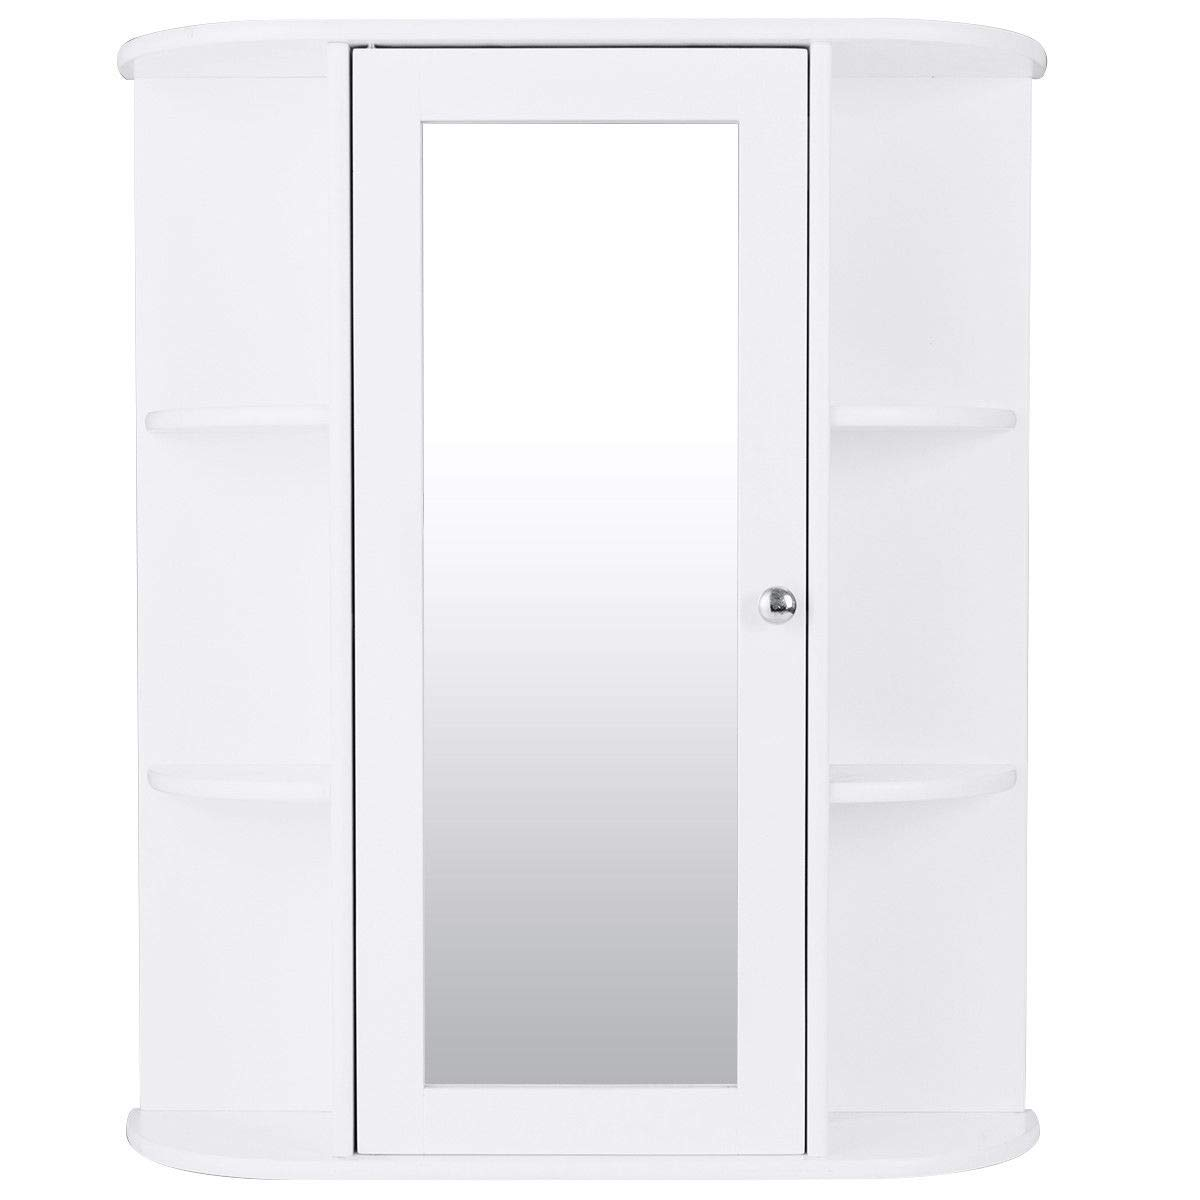 OHO NEW Bathroom Cabinet Single Door Shelves Wall Mount Cabinet W/Mirror Organizer